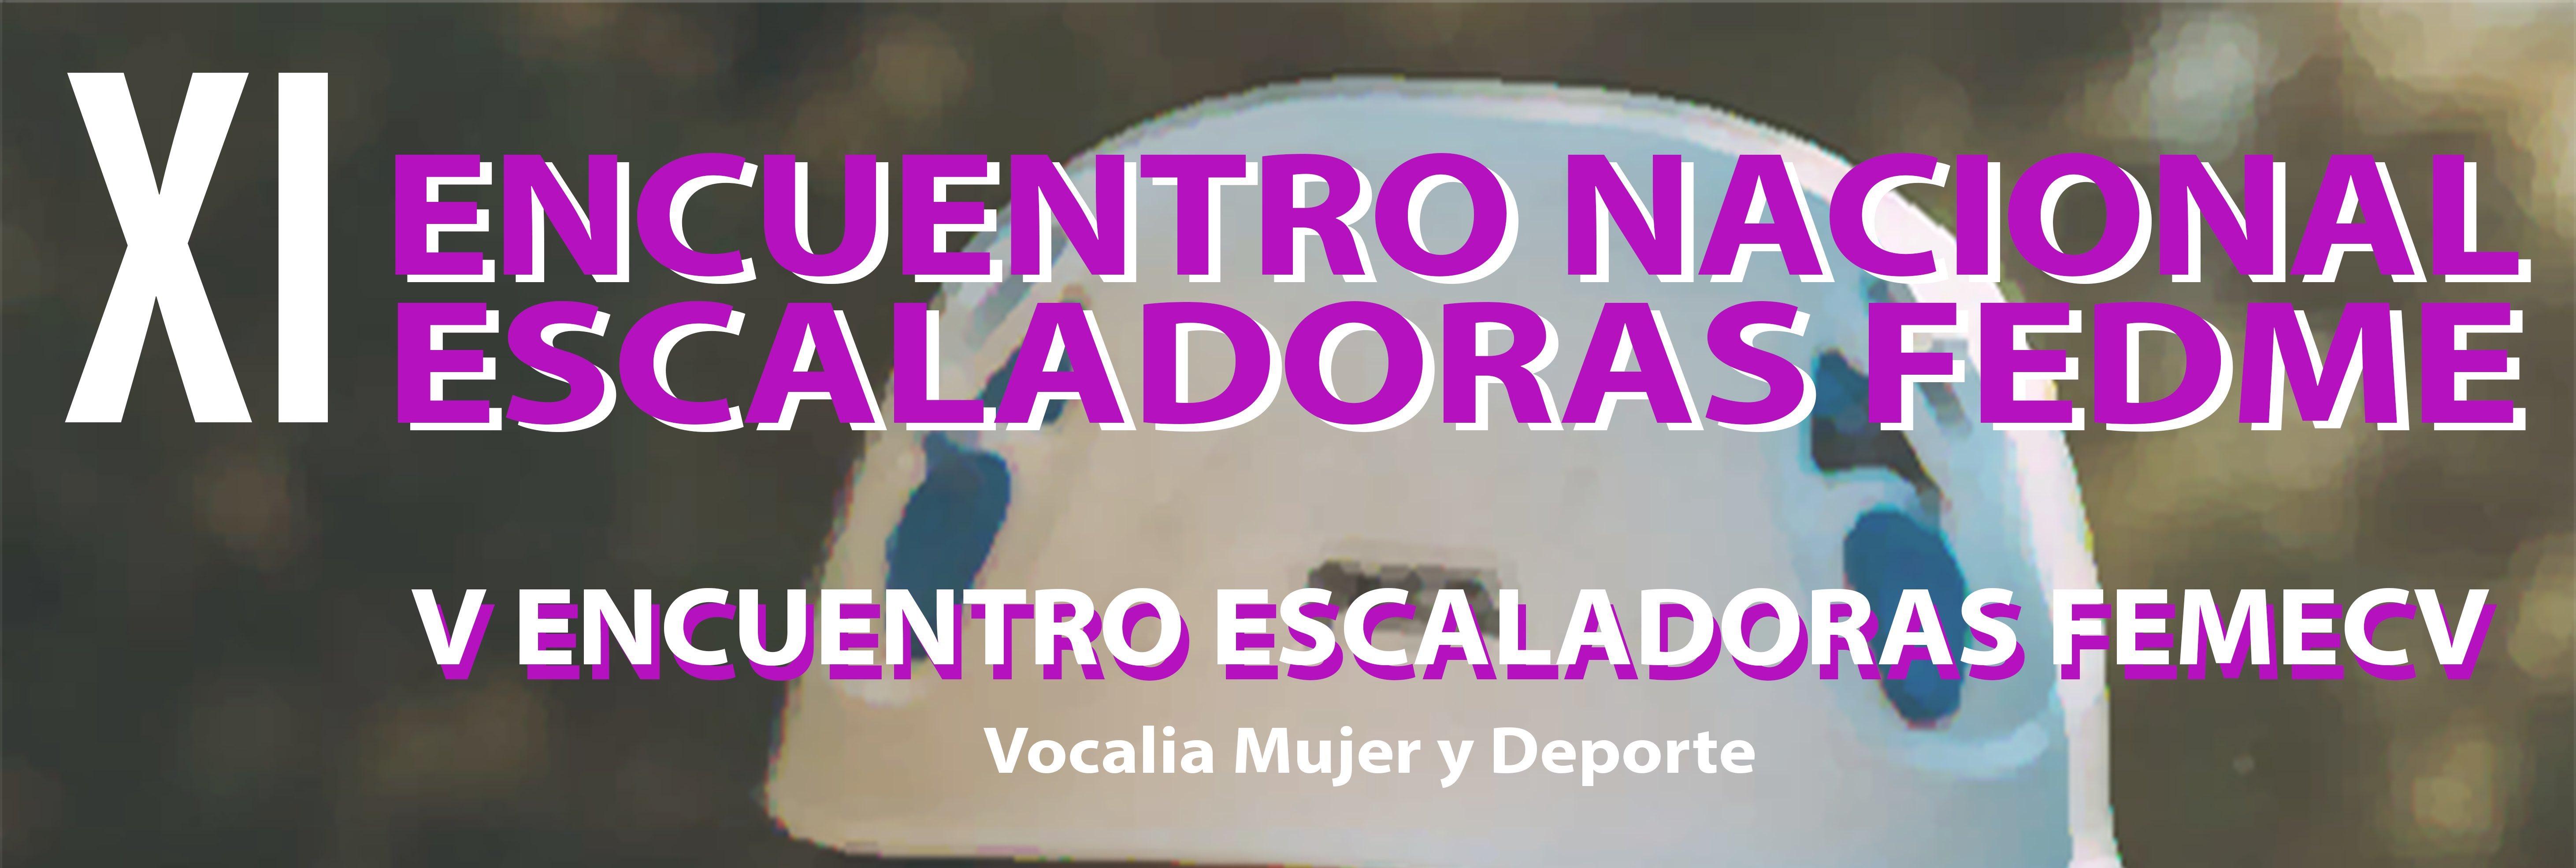 XI Encuentro Nacional de Escaladoras FEDME